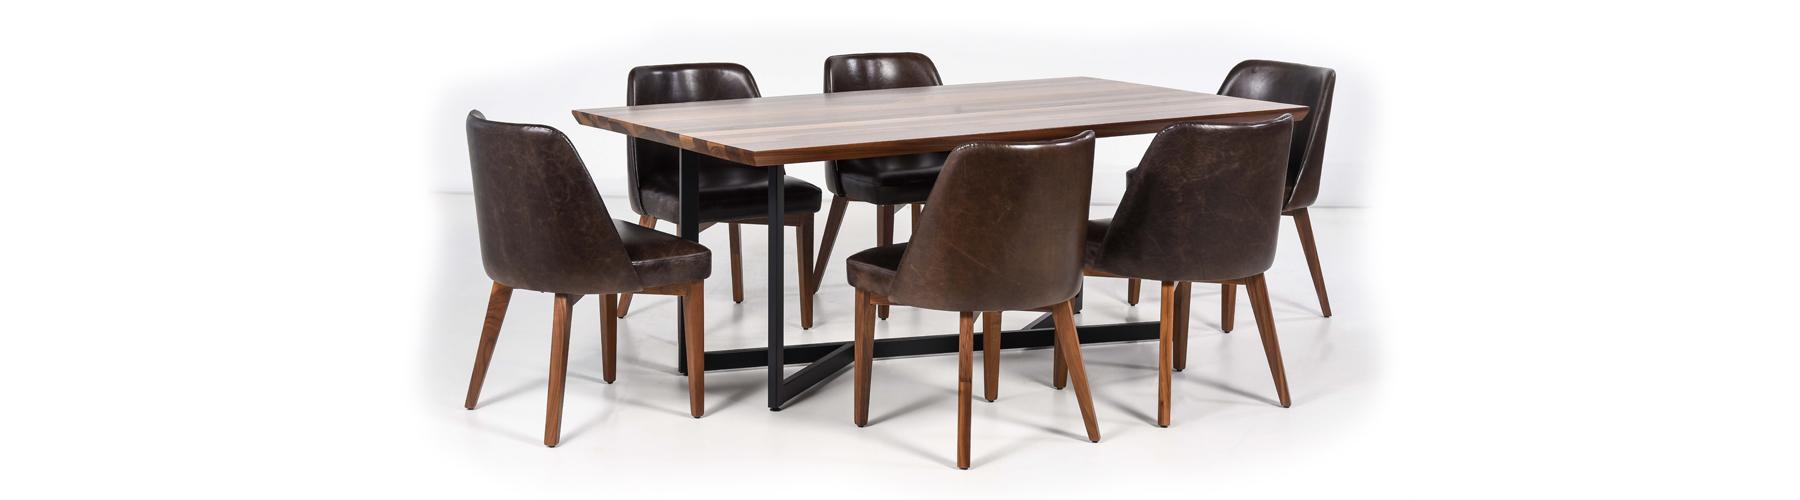 Yola - Table - William - ambiance